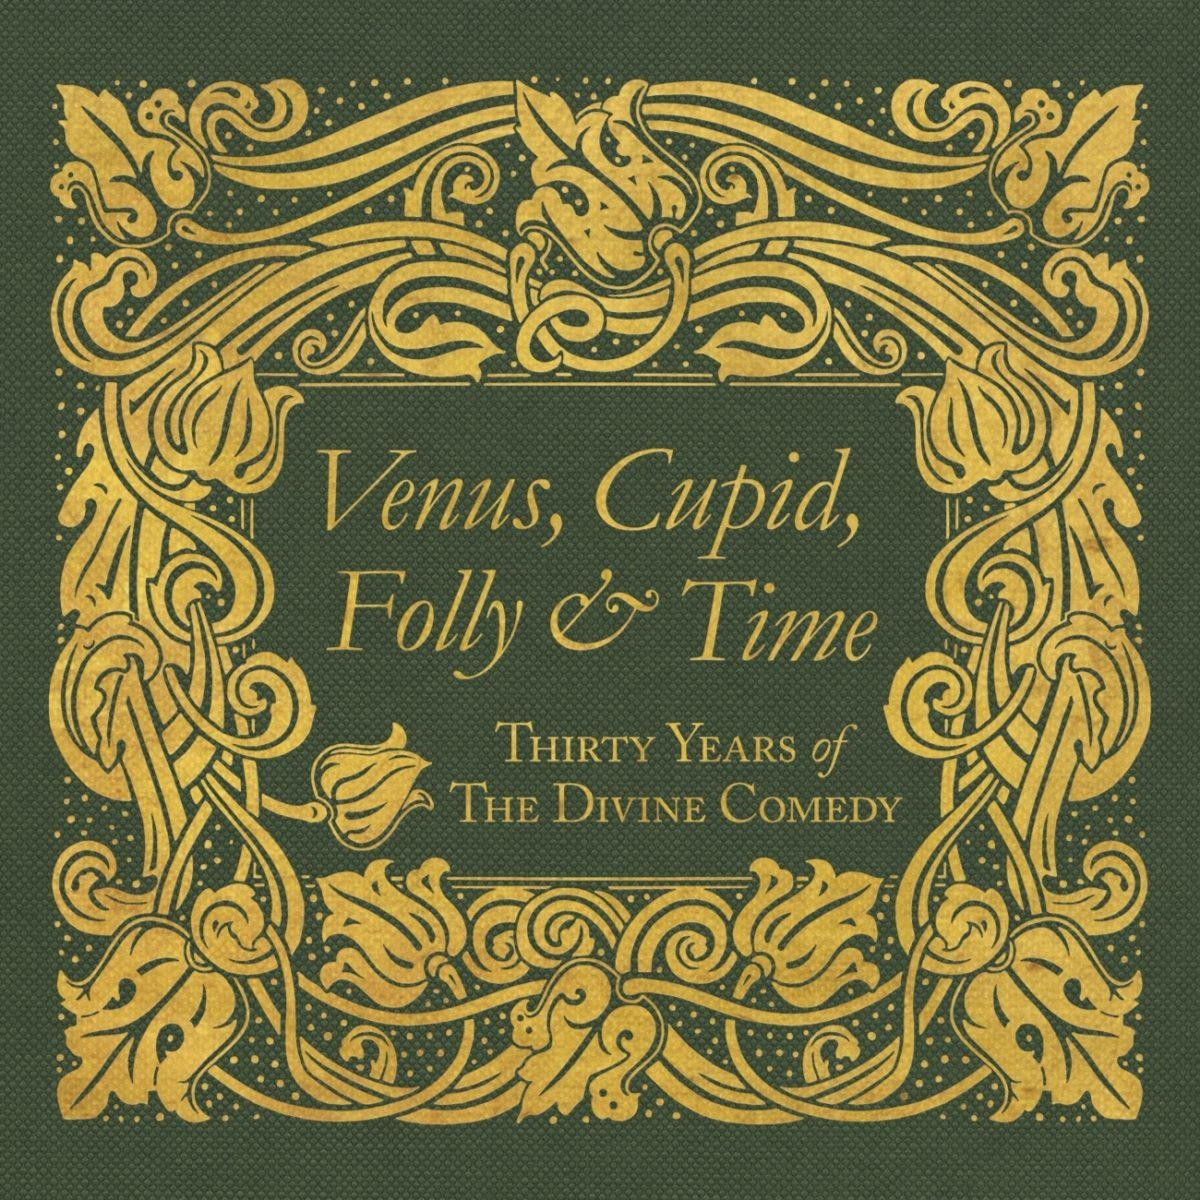 Venus, Cupid, Folly & Time - The Divine Comedy